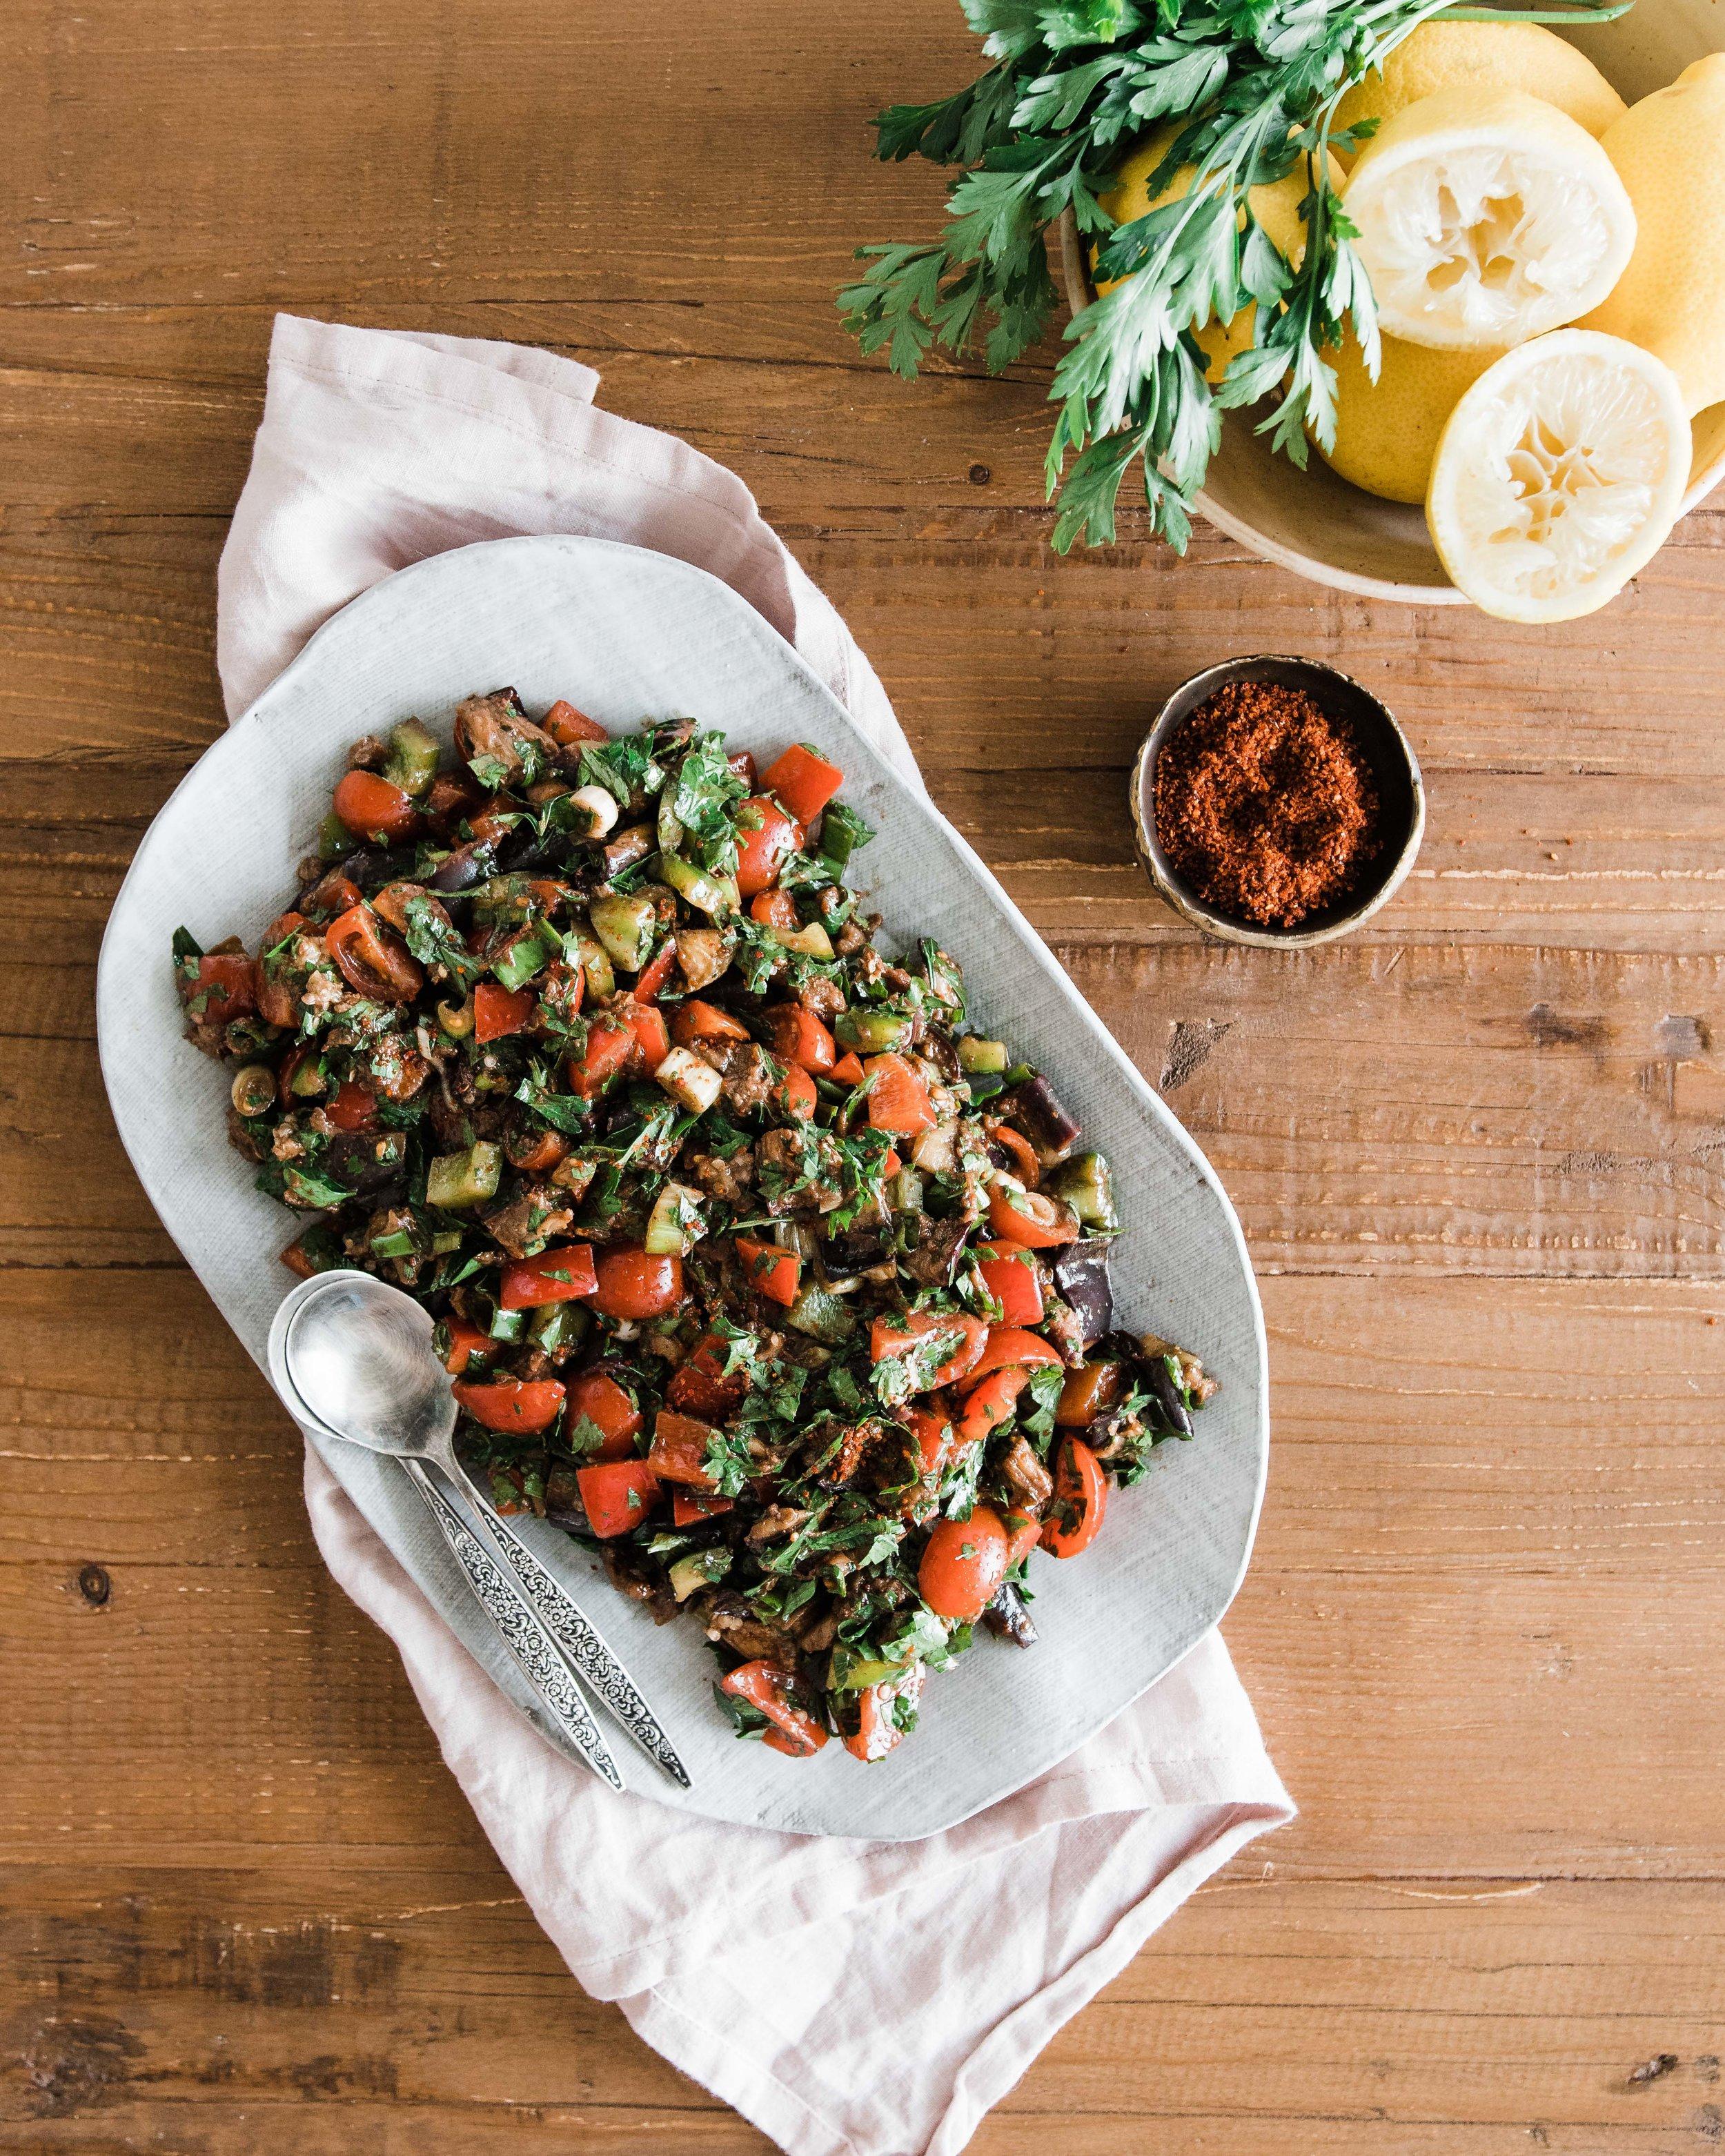 Syrian Eggplant Salad